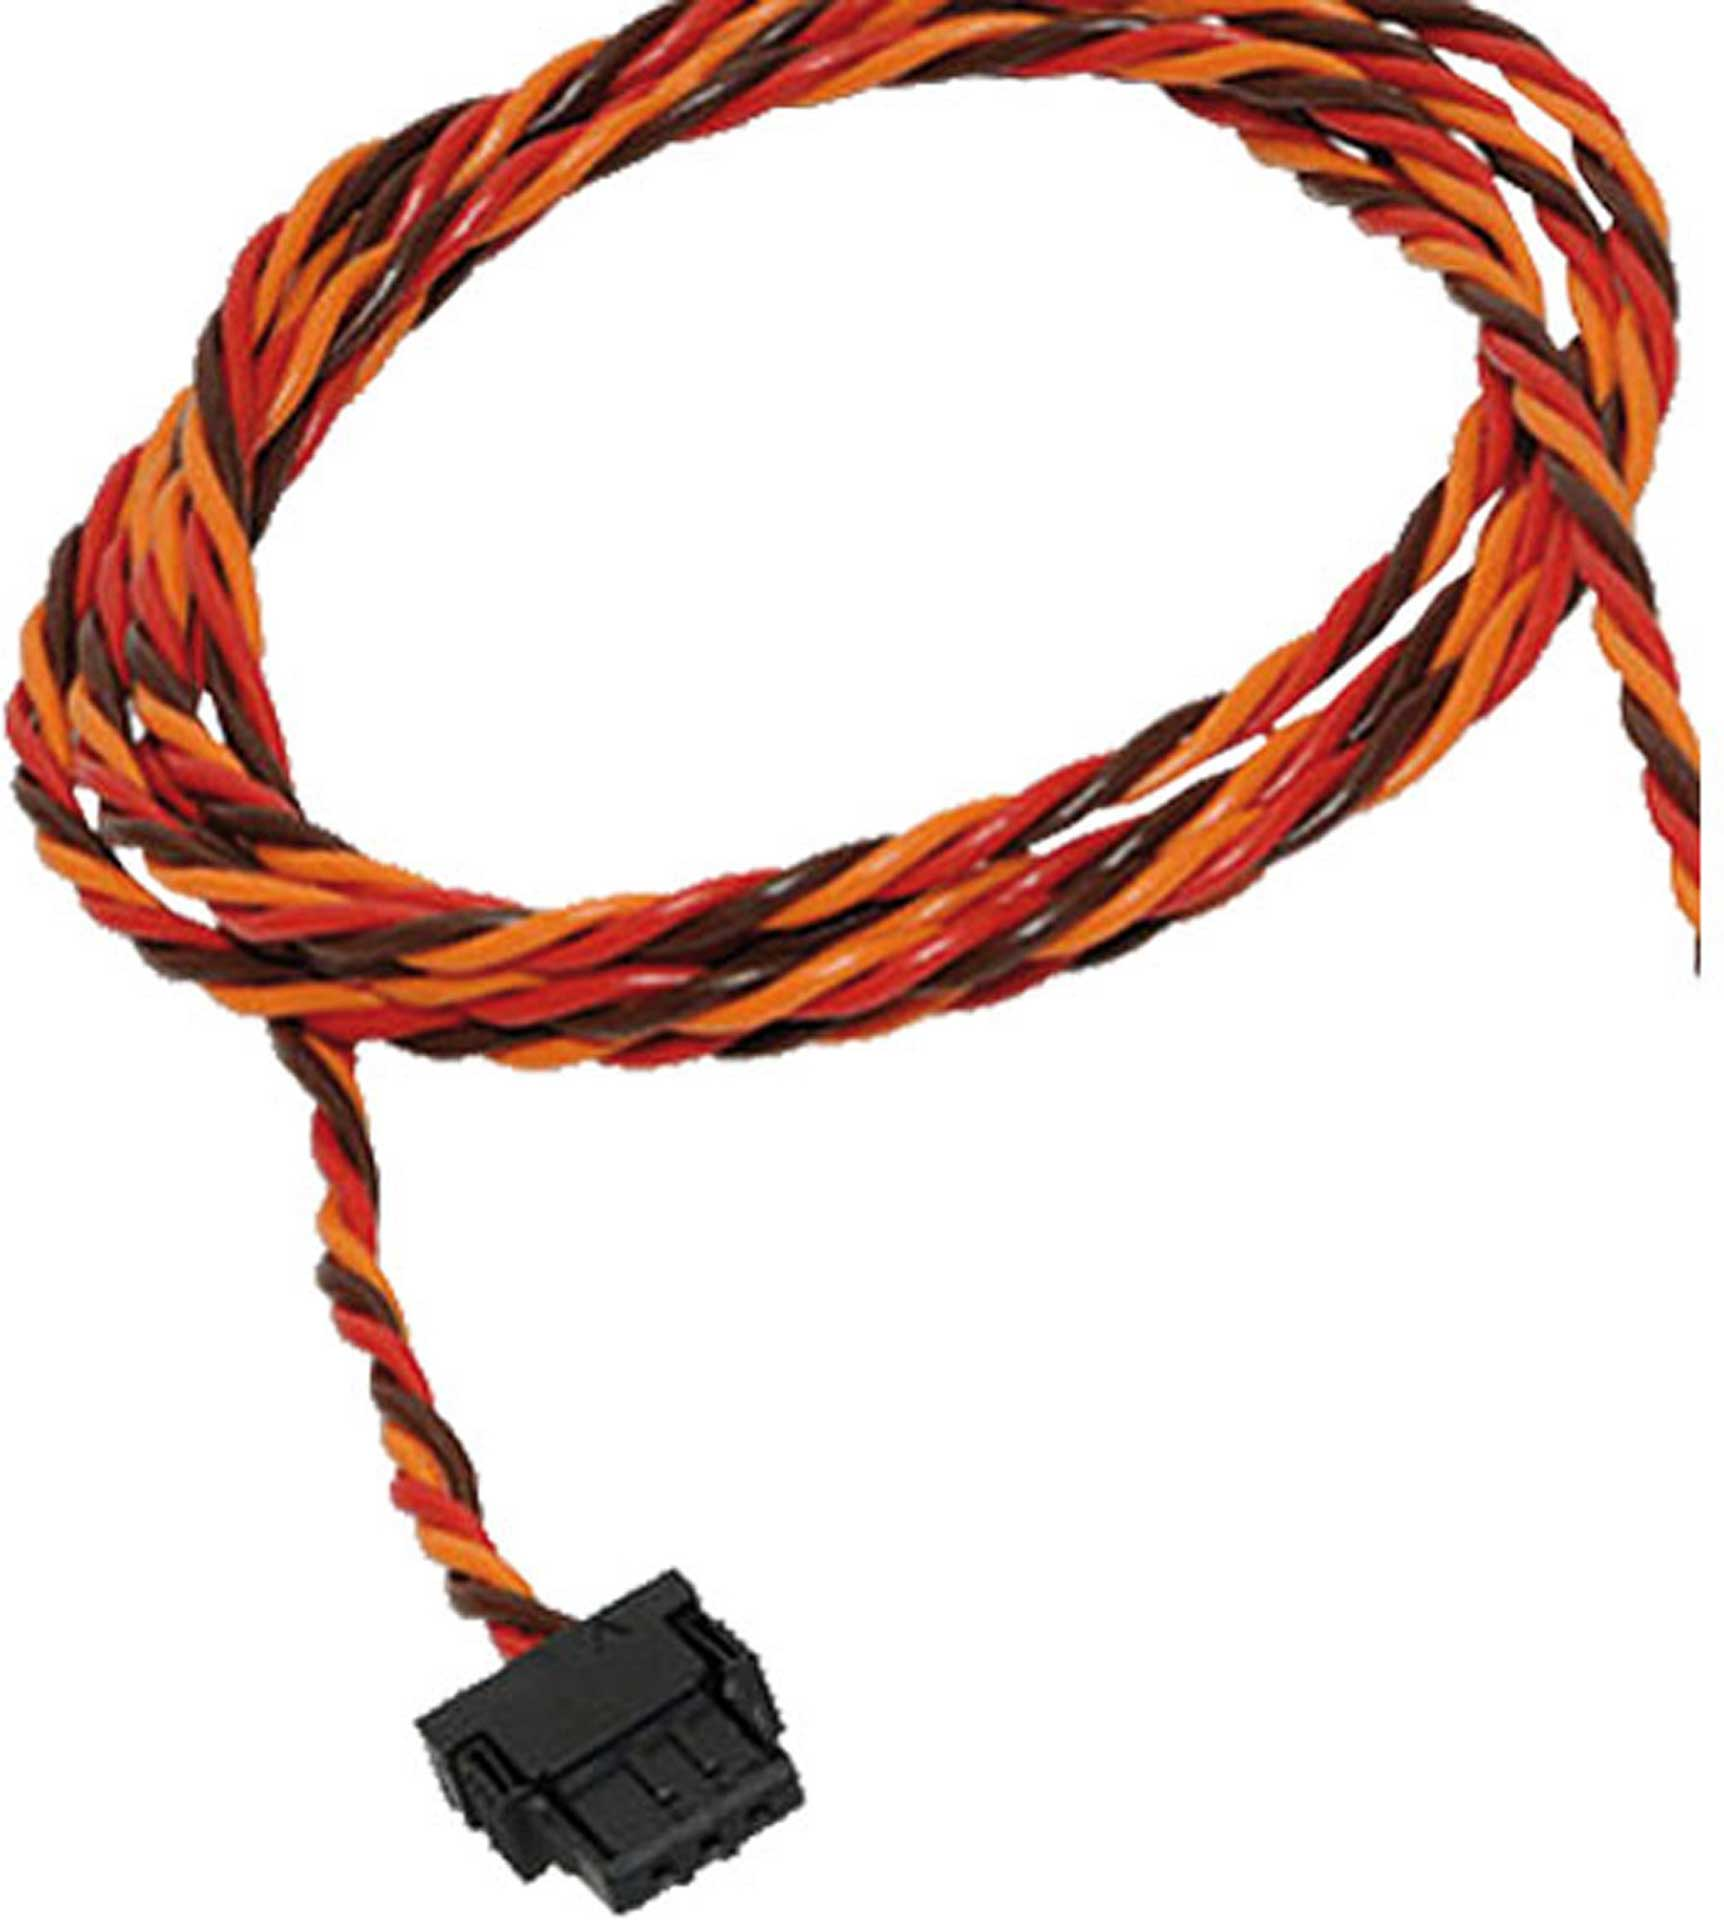 EMCOTEC WING CONNECTOR EWC3 ANSCHLUSSKABEL 200CM